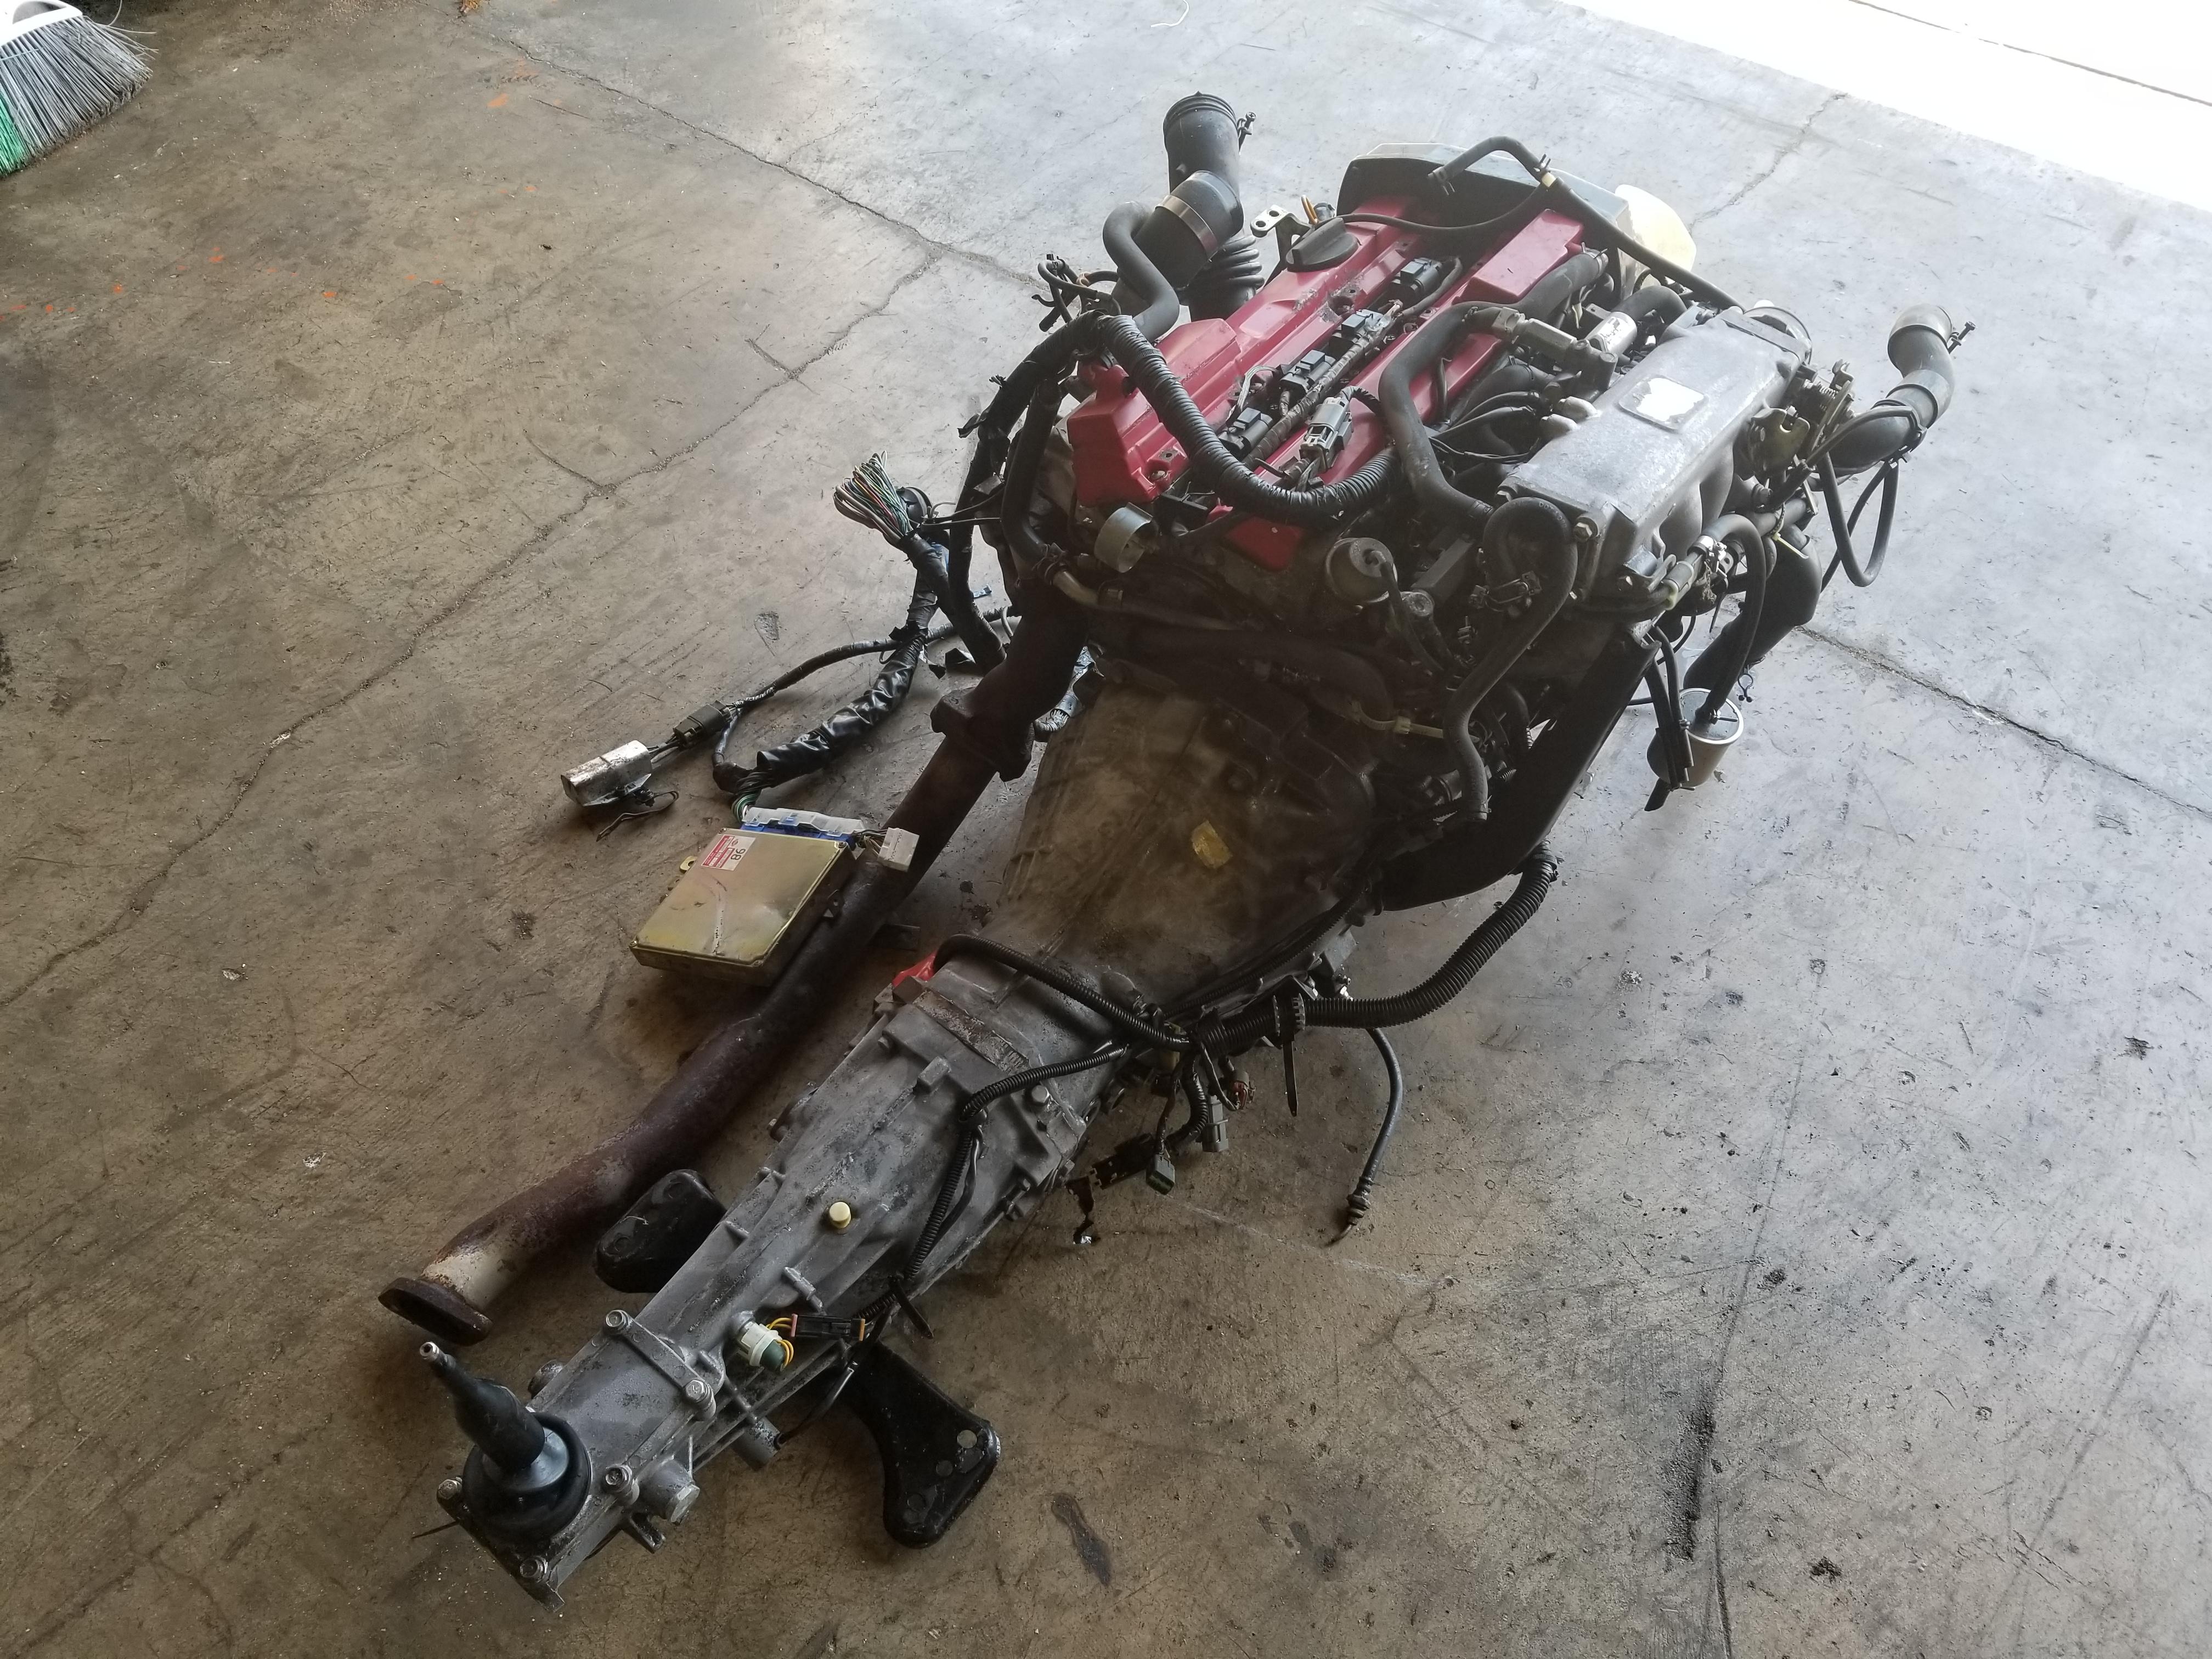 Admirable Ca18Det Turbo 5 Speed Manual Transmission Nissan 180Sx S13 240Sx 1 8 Wiring Digital Resources Operpmognl